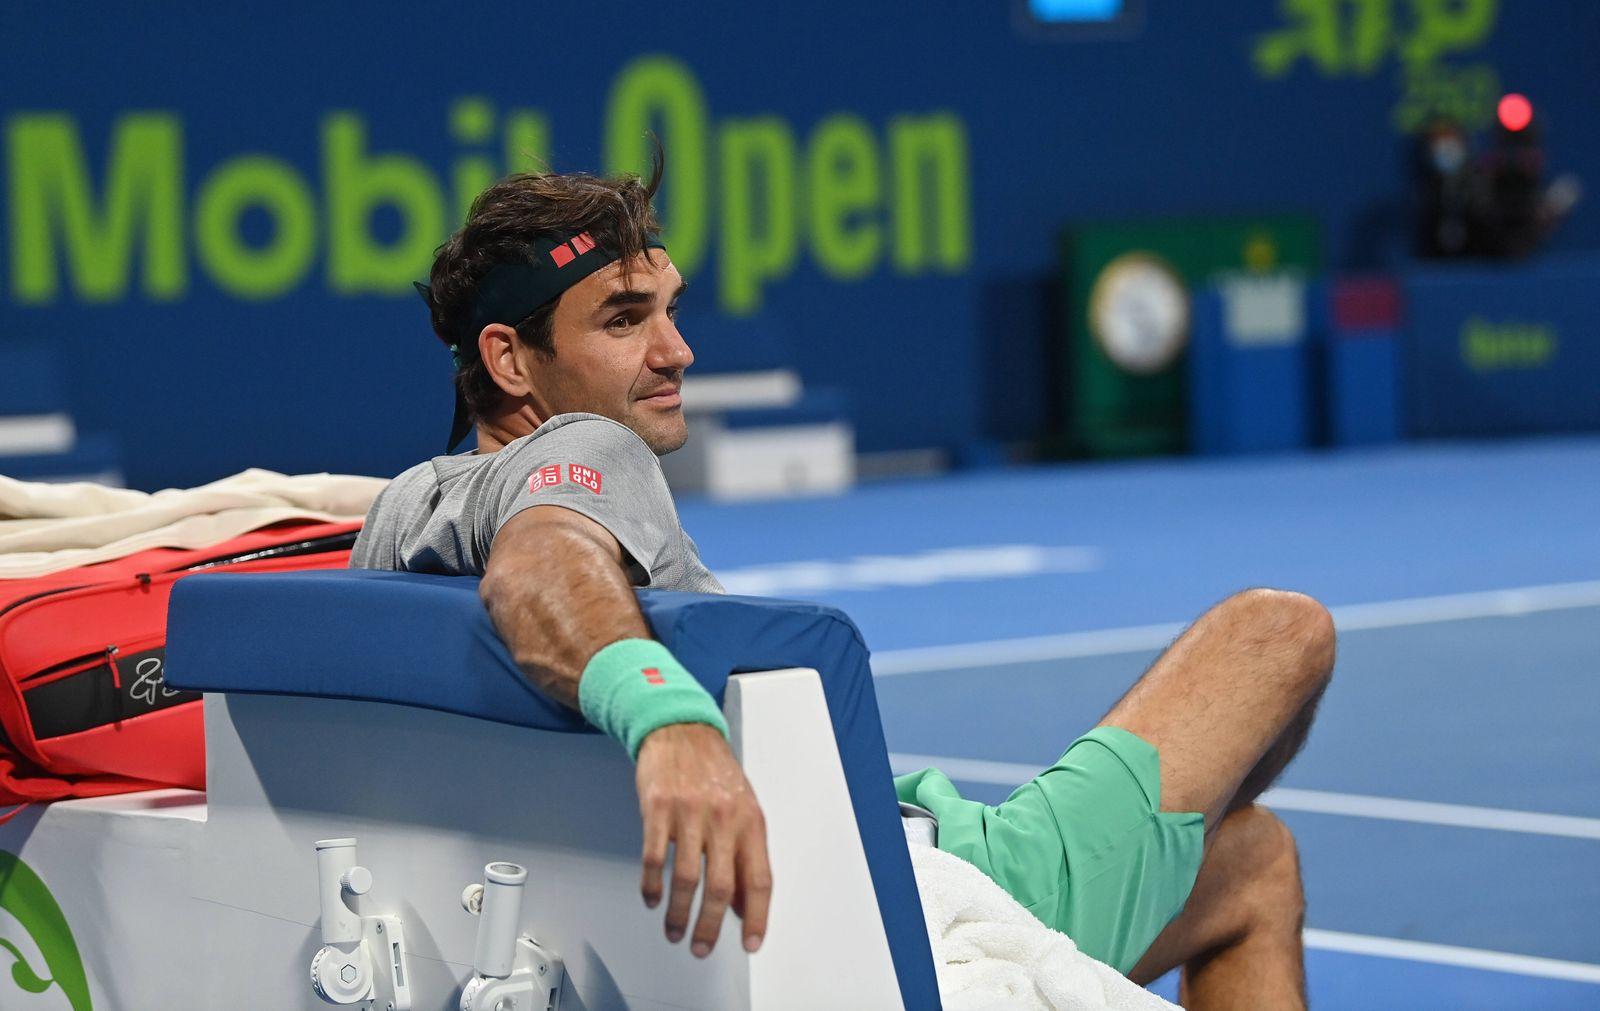 Qatar Exxon Mobil Open 2021 Roger Federer , Switzerland *** Qatar Exxon Mobil Open 2021 Roger Federer , Switzerland